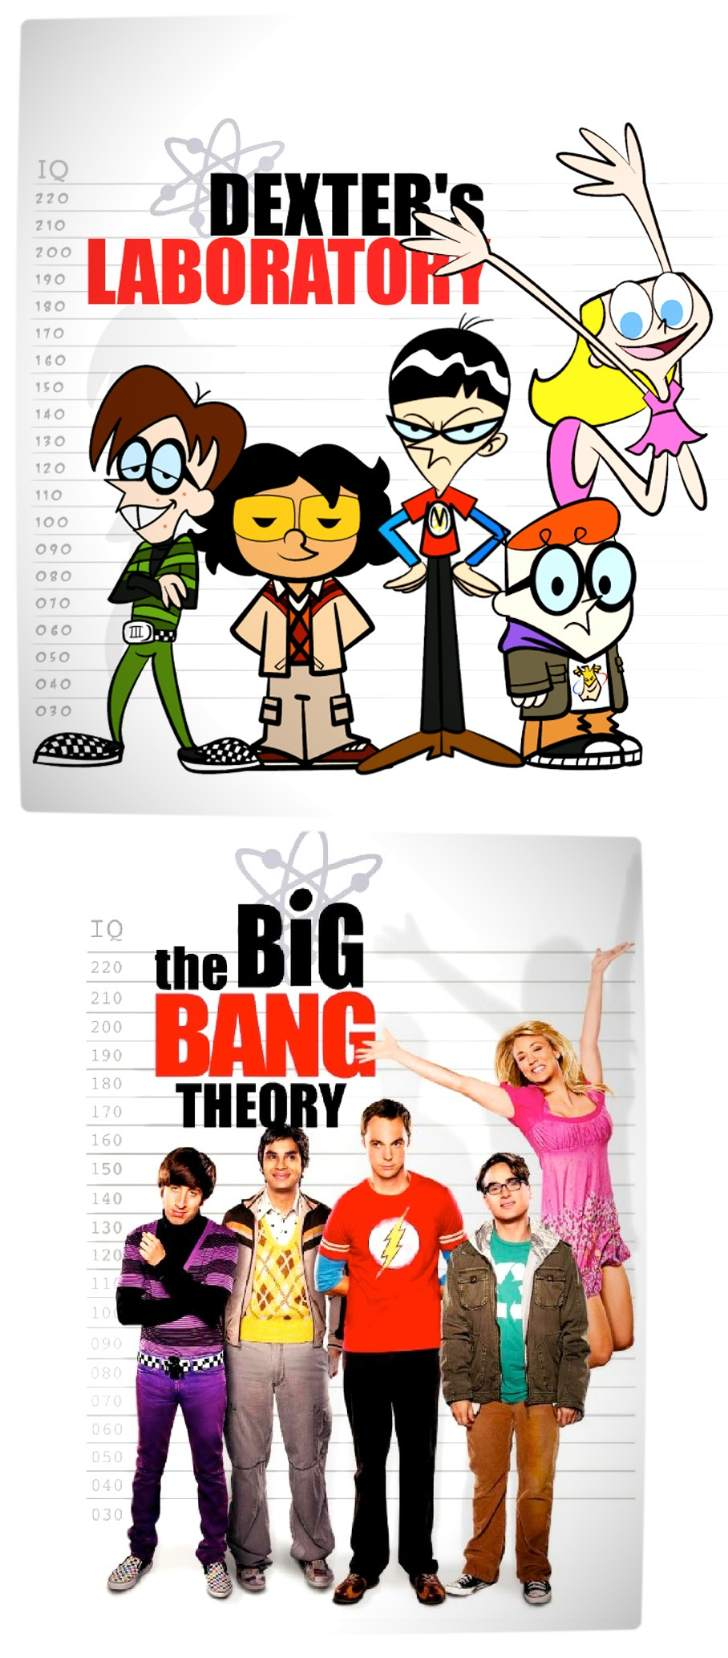 Dexter's Laboratory vs The Big Bang Theory